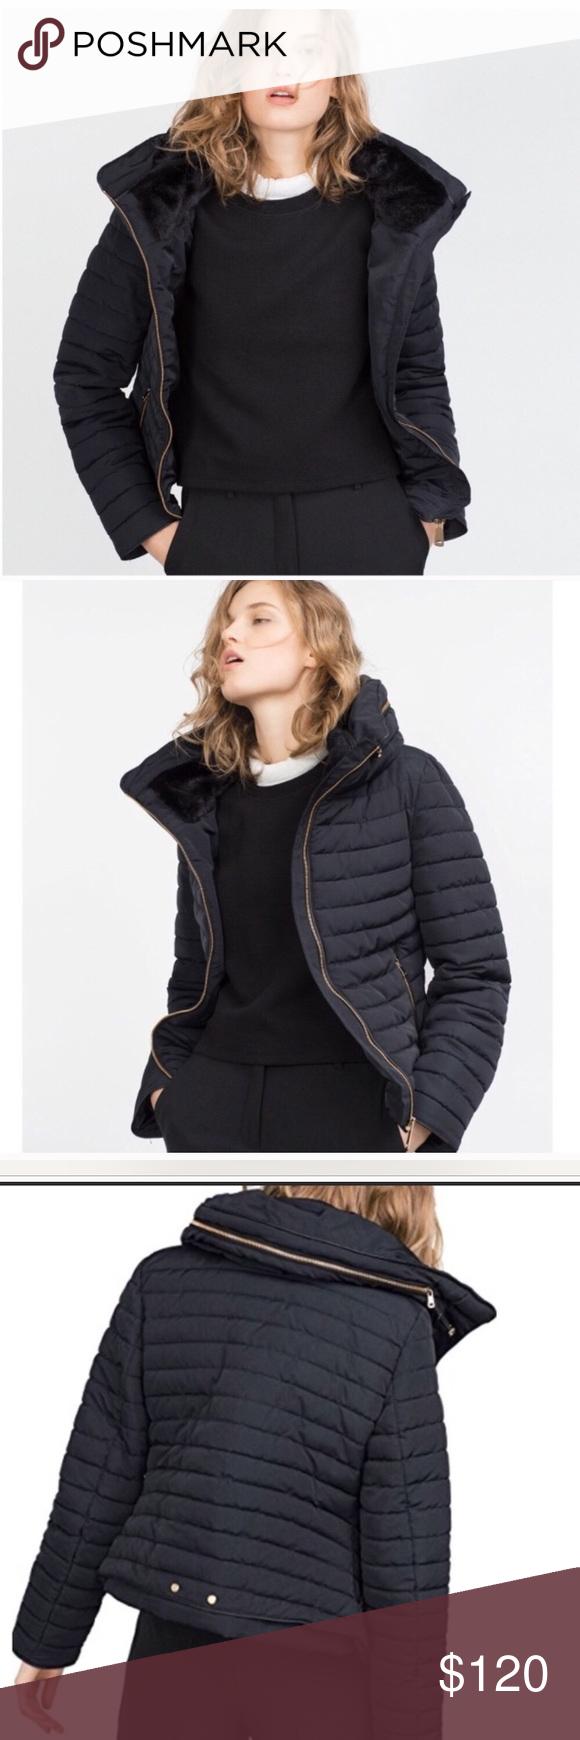 Zara Basic Outerwear Department Puffer Jacket Sz L Zara Basic Fashion Clothes Design [ 1740 x 580 Pixel ]